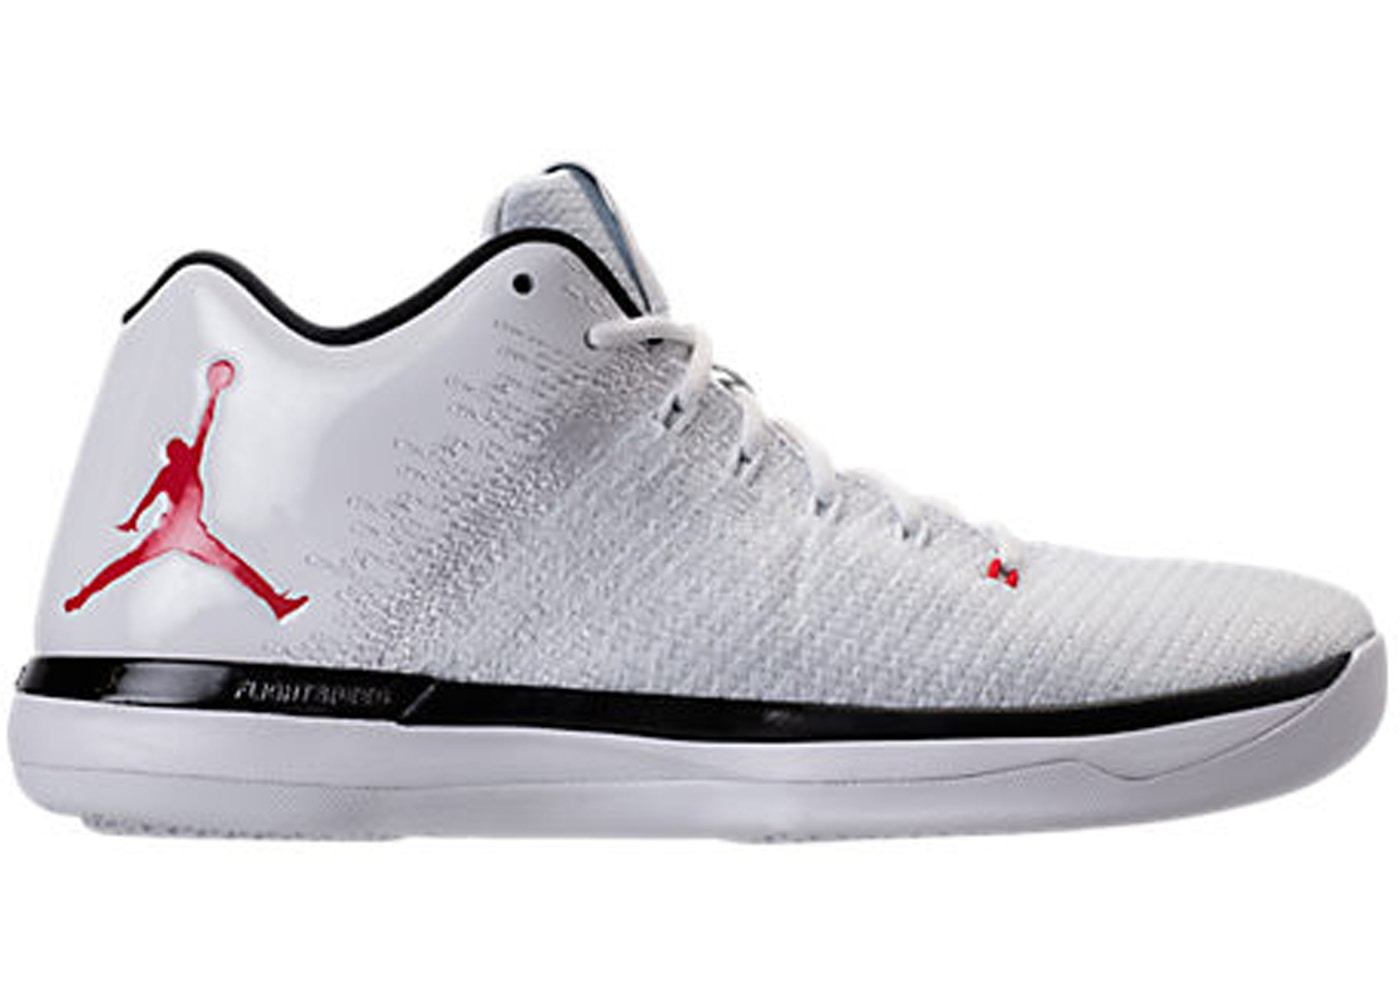 low priced c2faa 59cce Buy Air Jordan 31 Shoes & Deadstock Sneakers